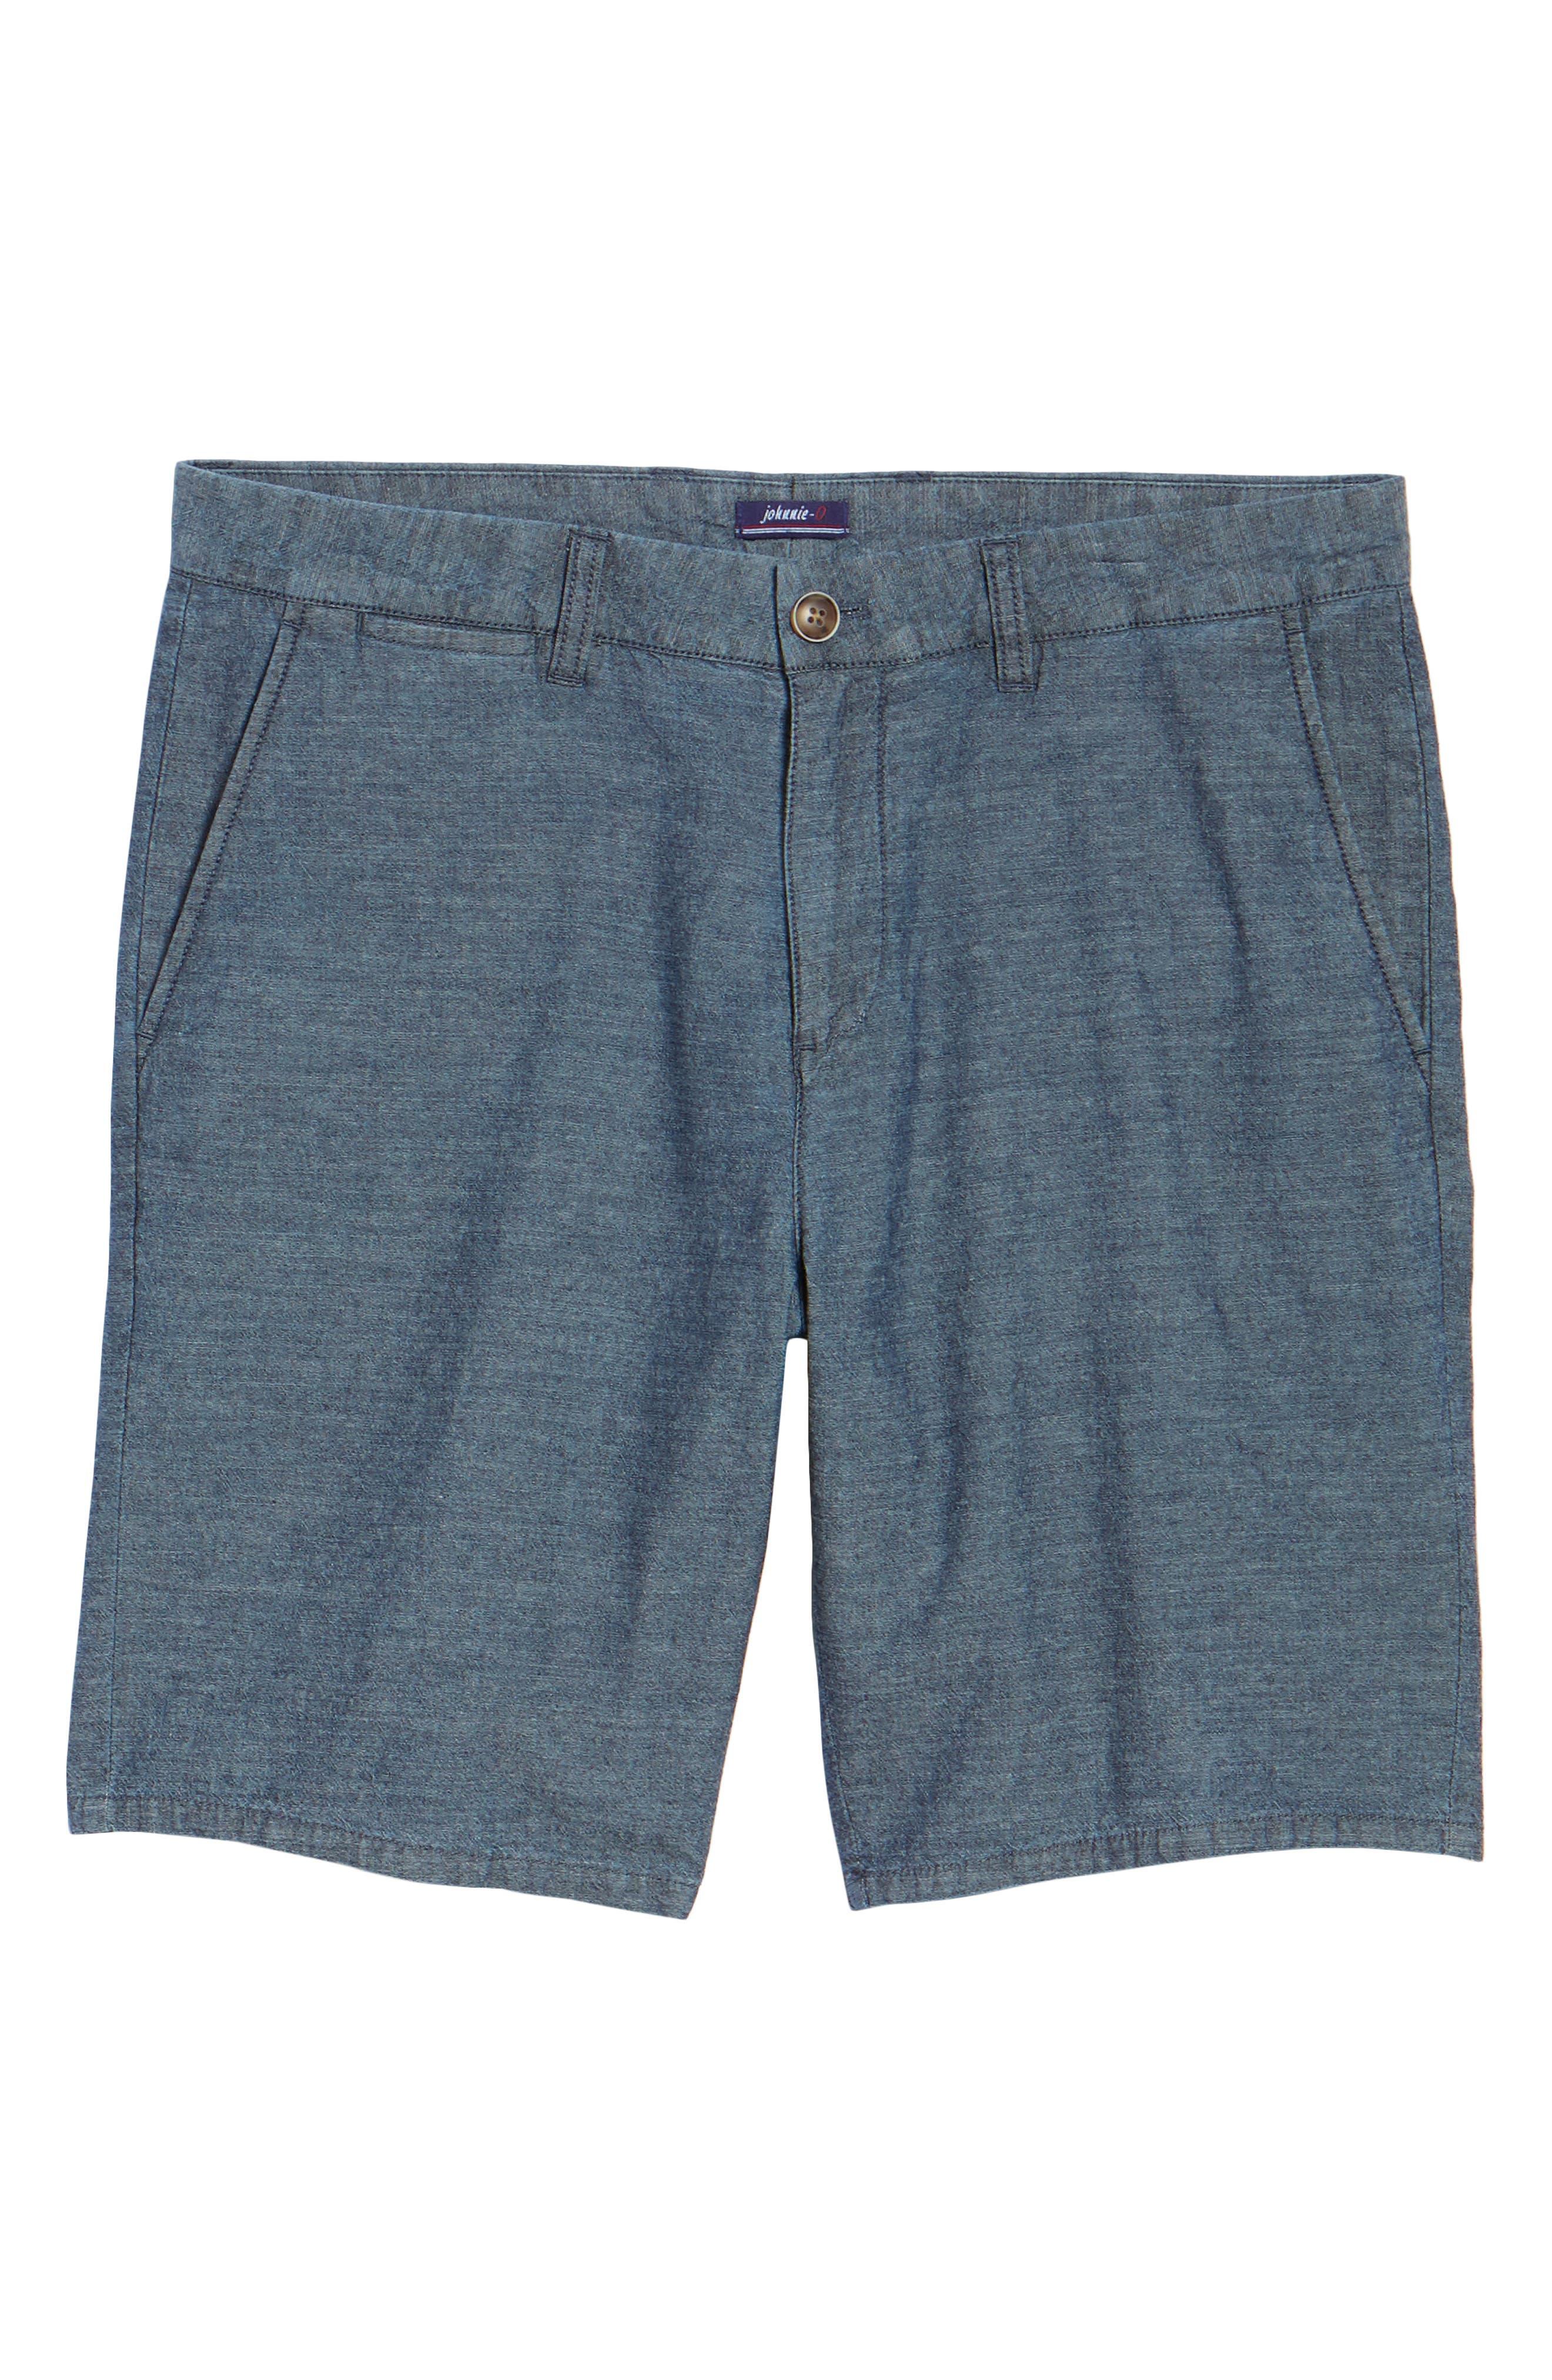 JOHNNIE-O,                             Perkins Regular Fit Shorts,                             Alternate thumbnail 6, color,                             400